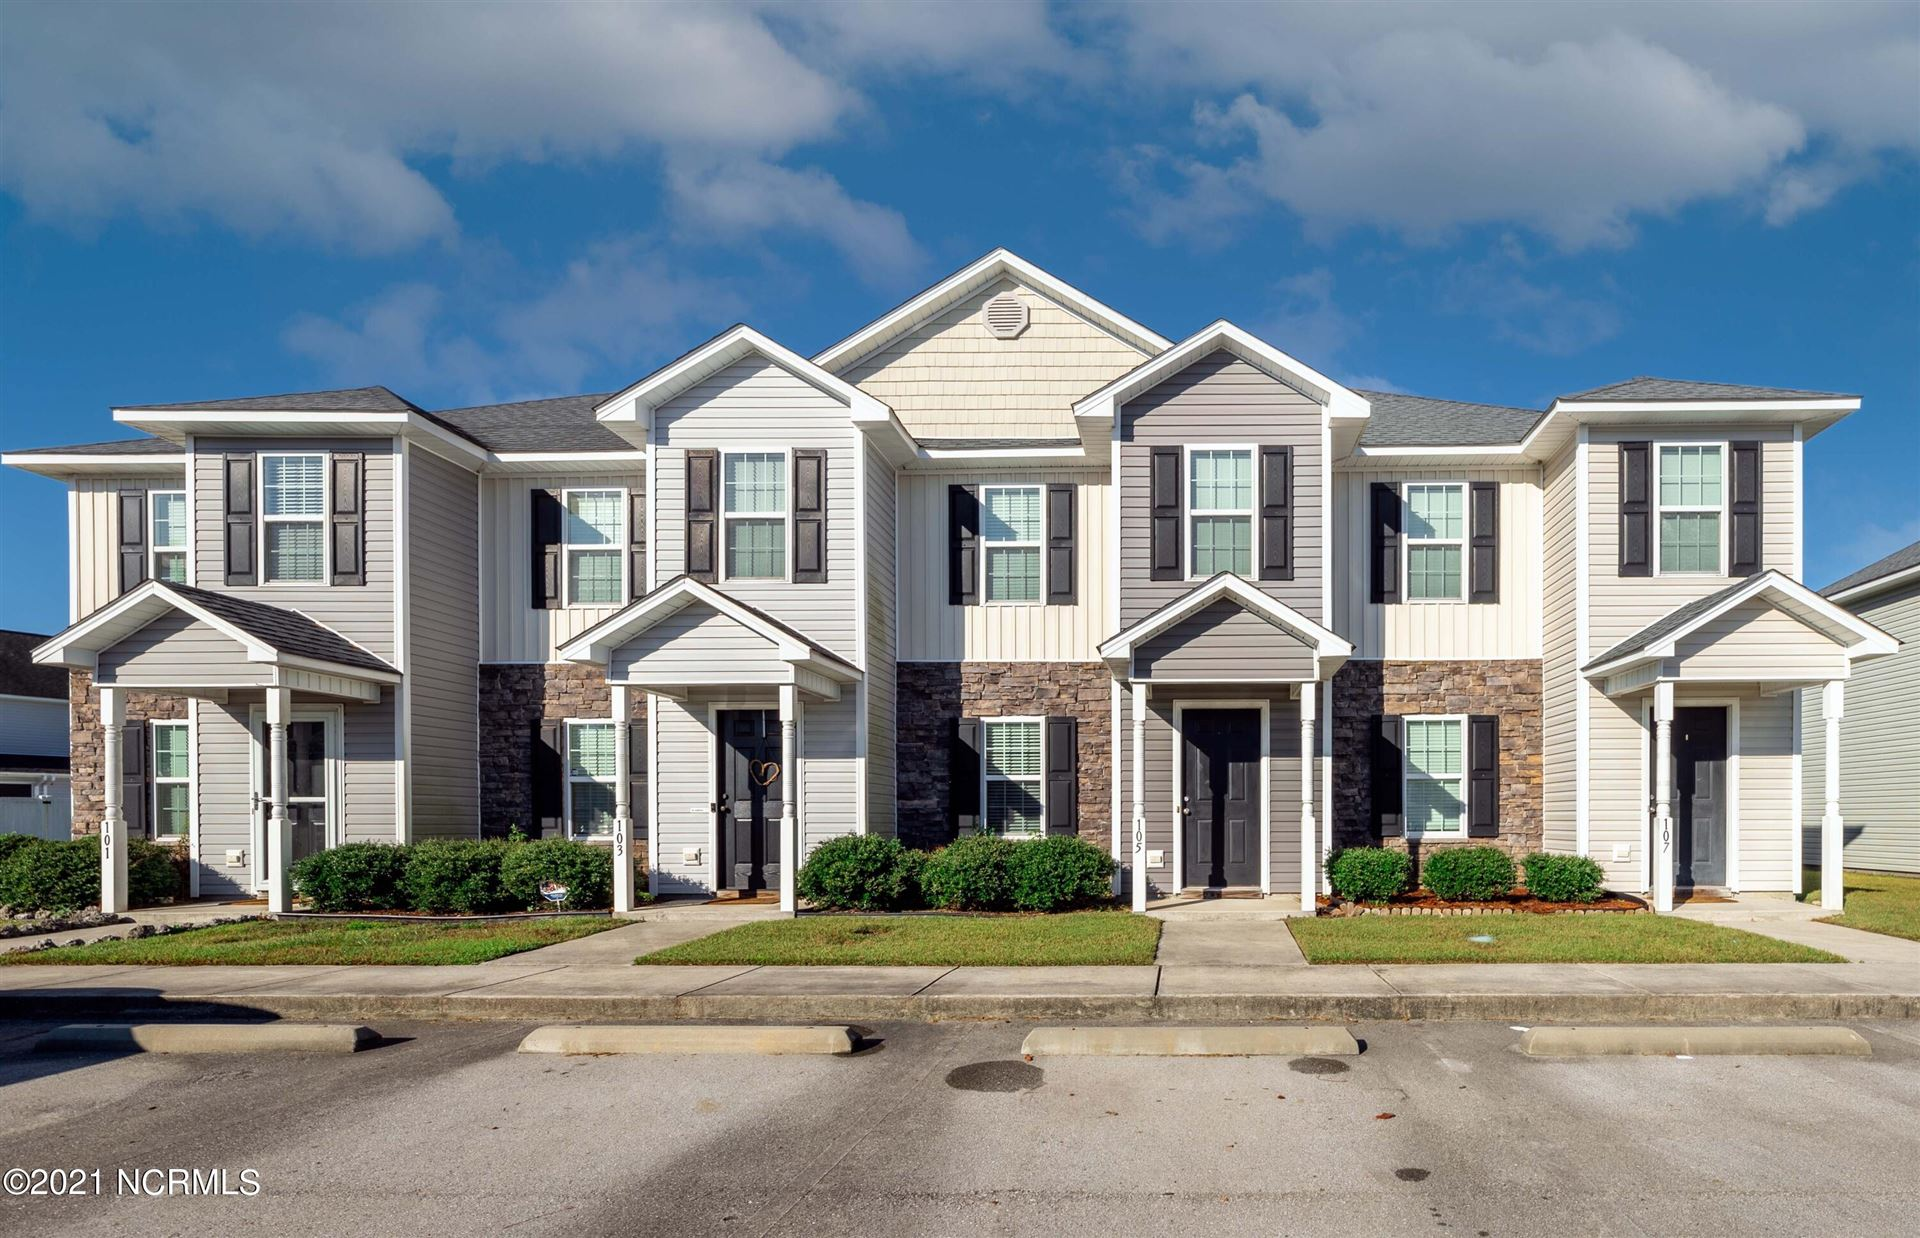 Photo of 105 Glen Cannon Drive, Jacksonville, NC 28546 (MLS # 100292550)